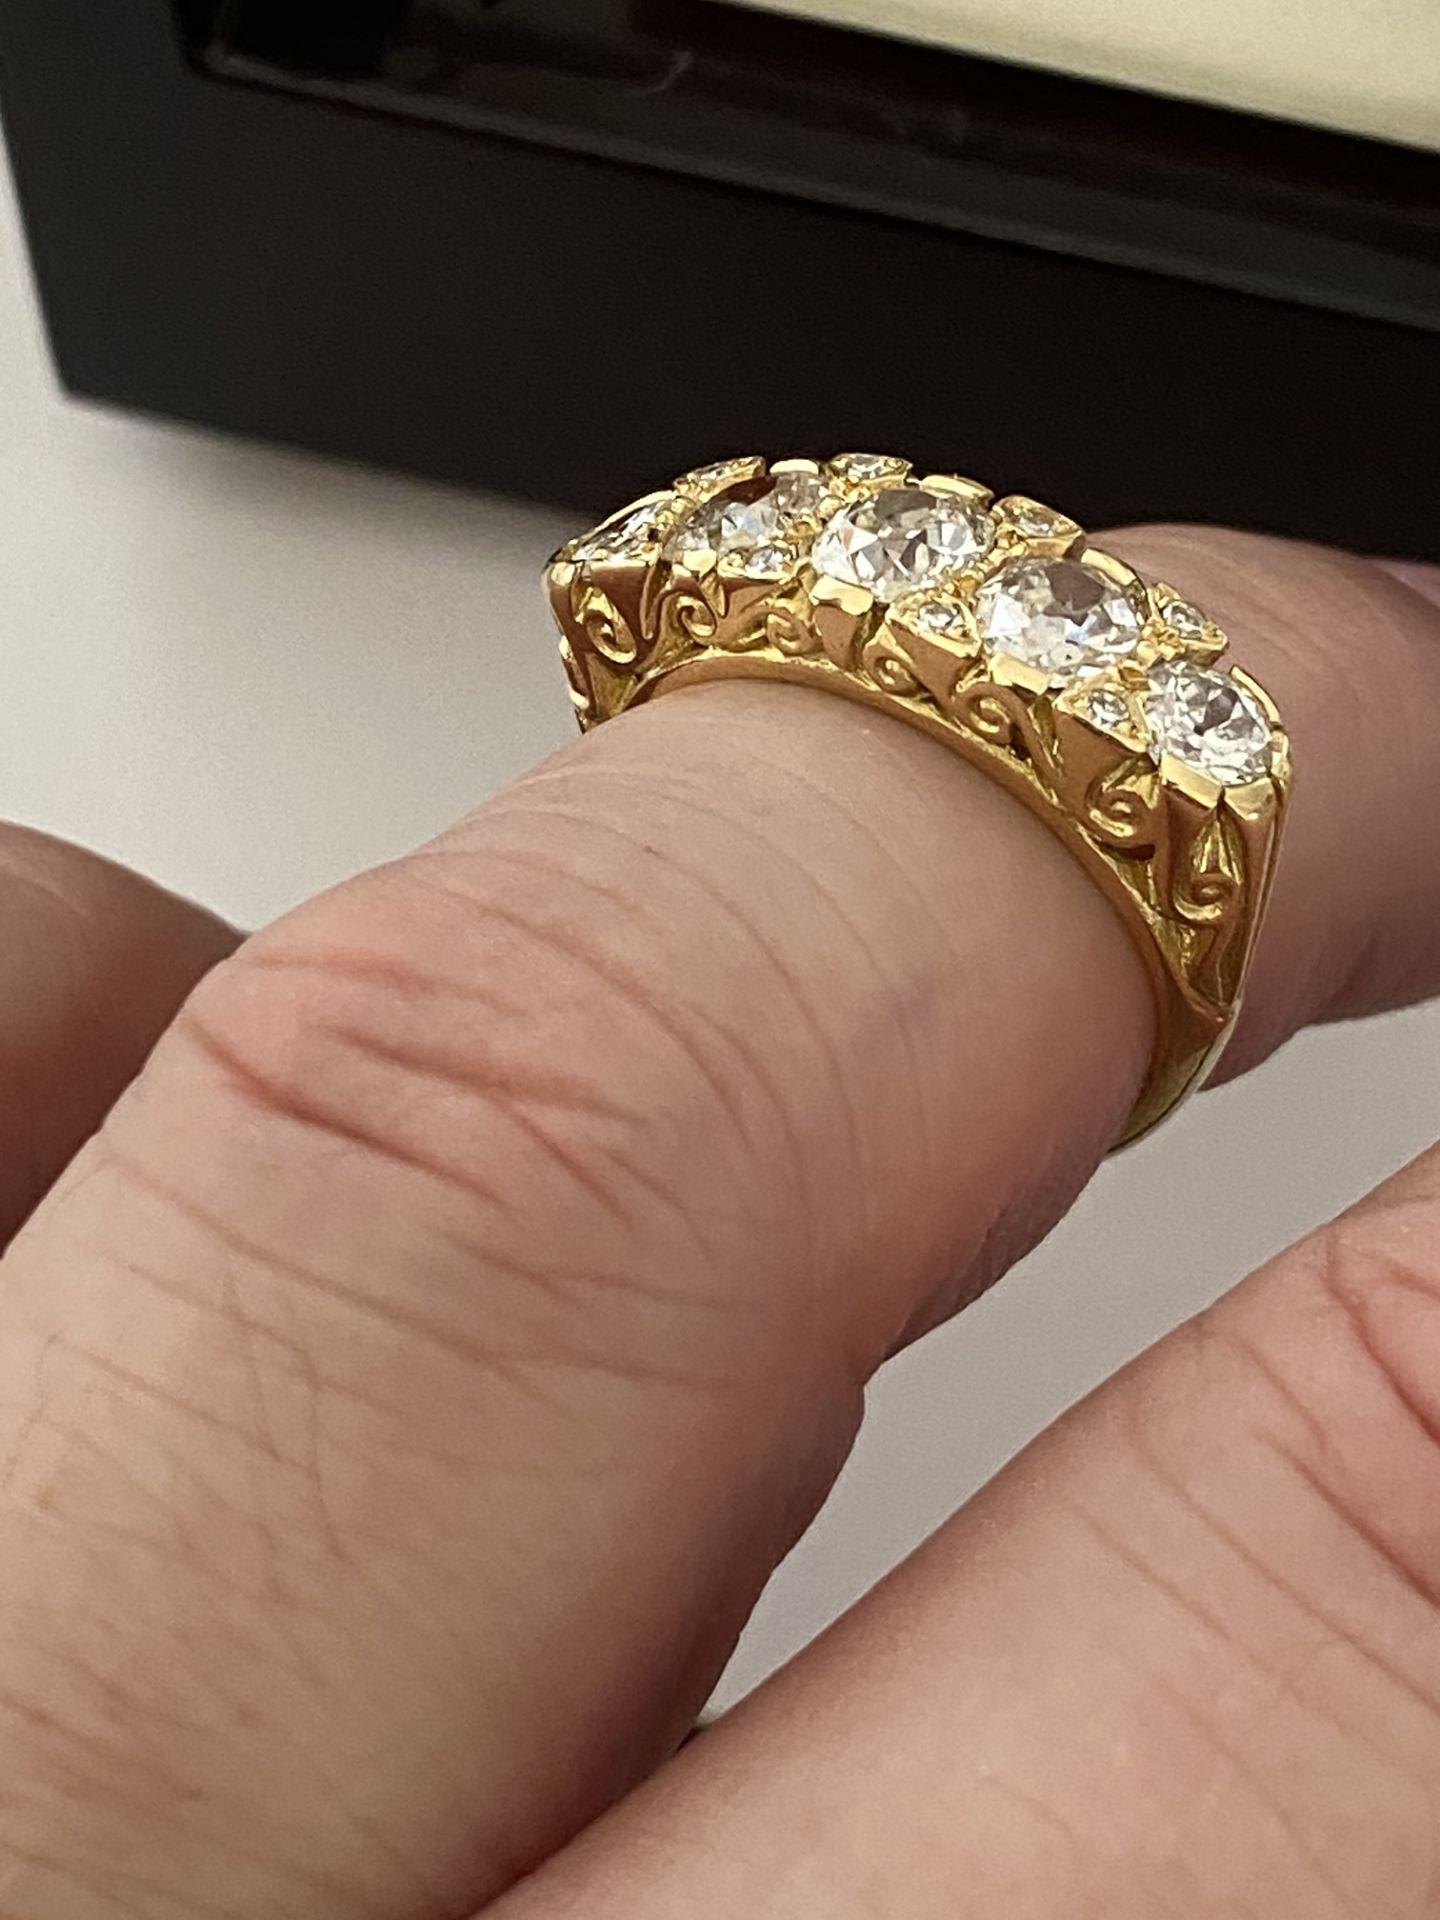 FINE 18ct YELLOW GOLD 2.00ct 5 STONE DIAMOND RING - Image 3 of 15